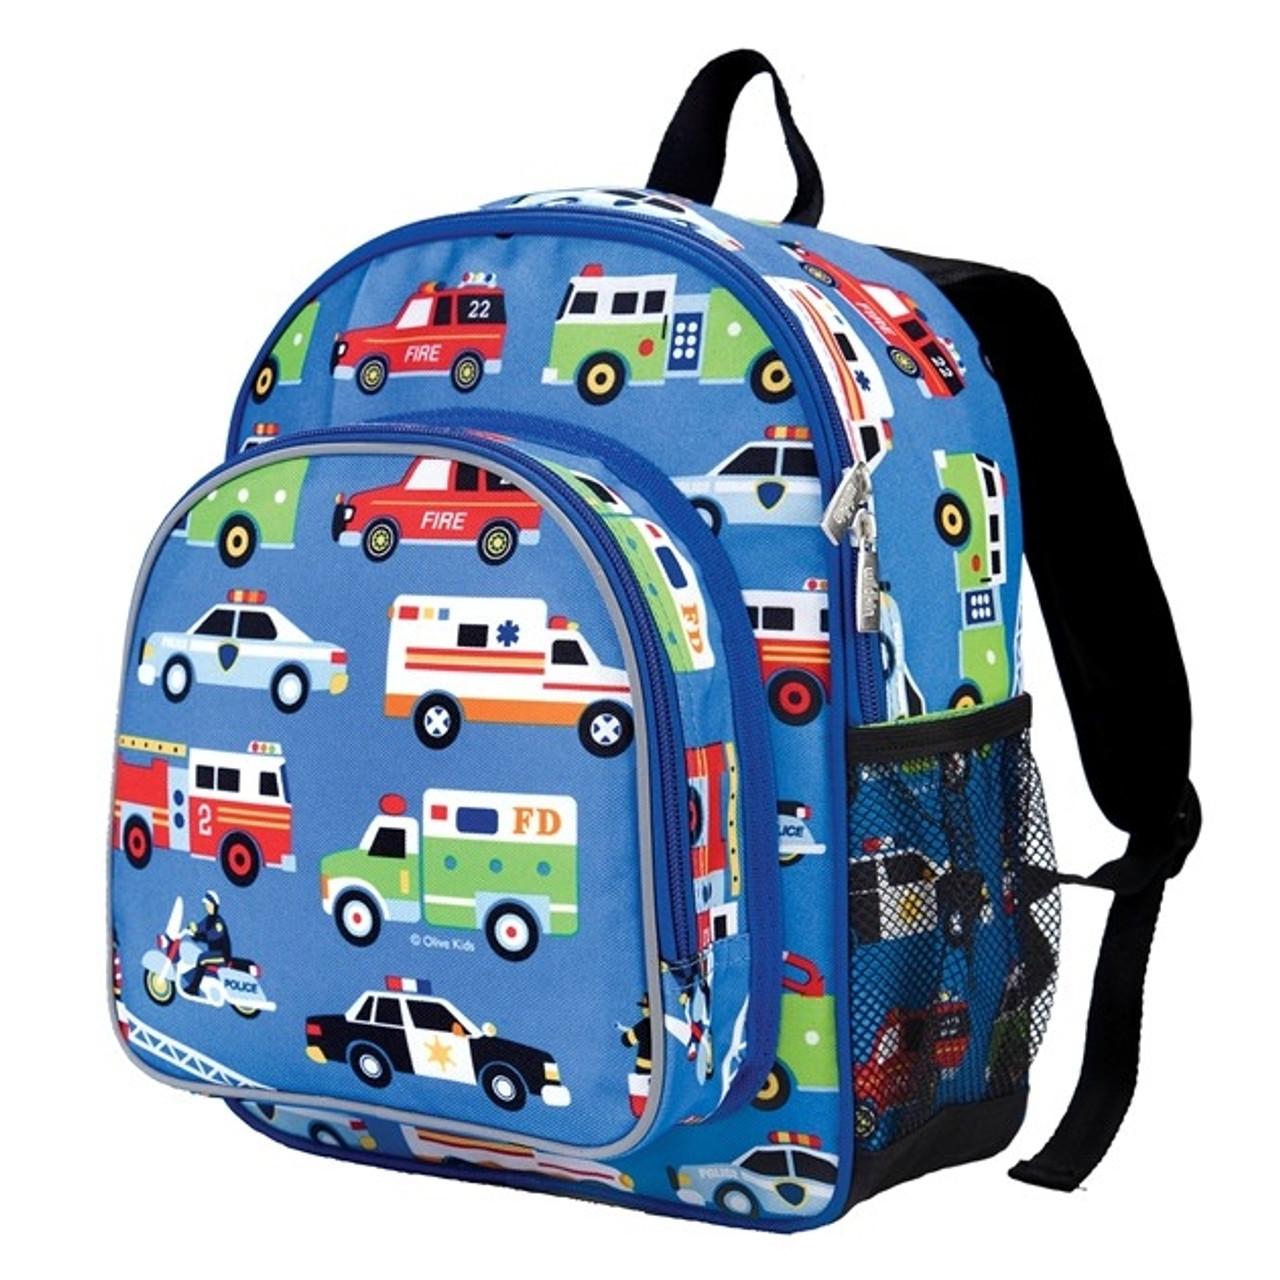 Wildkin Toddler Backpack - Action Vehicles 204ba15ed3b82